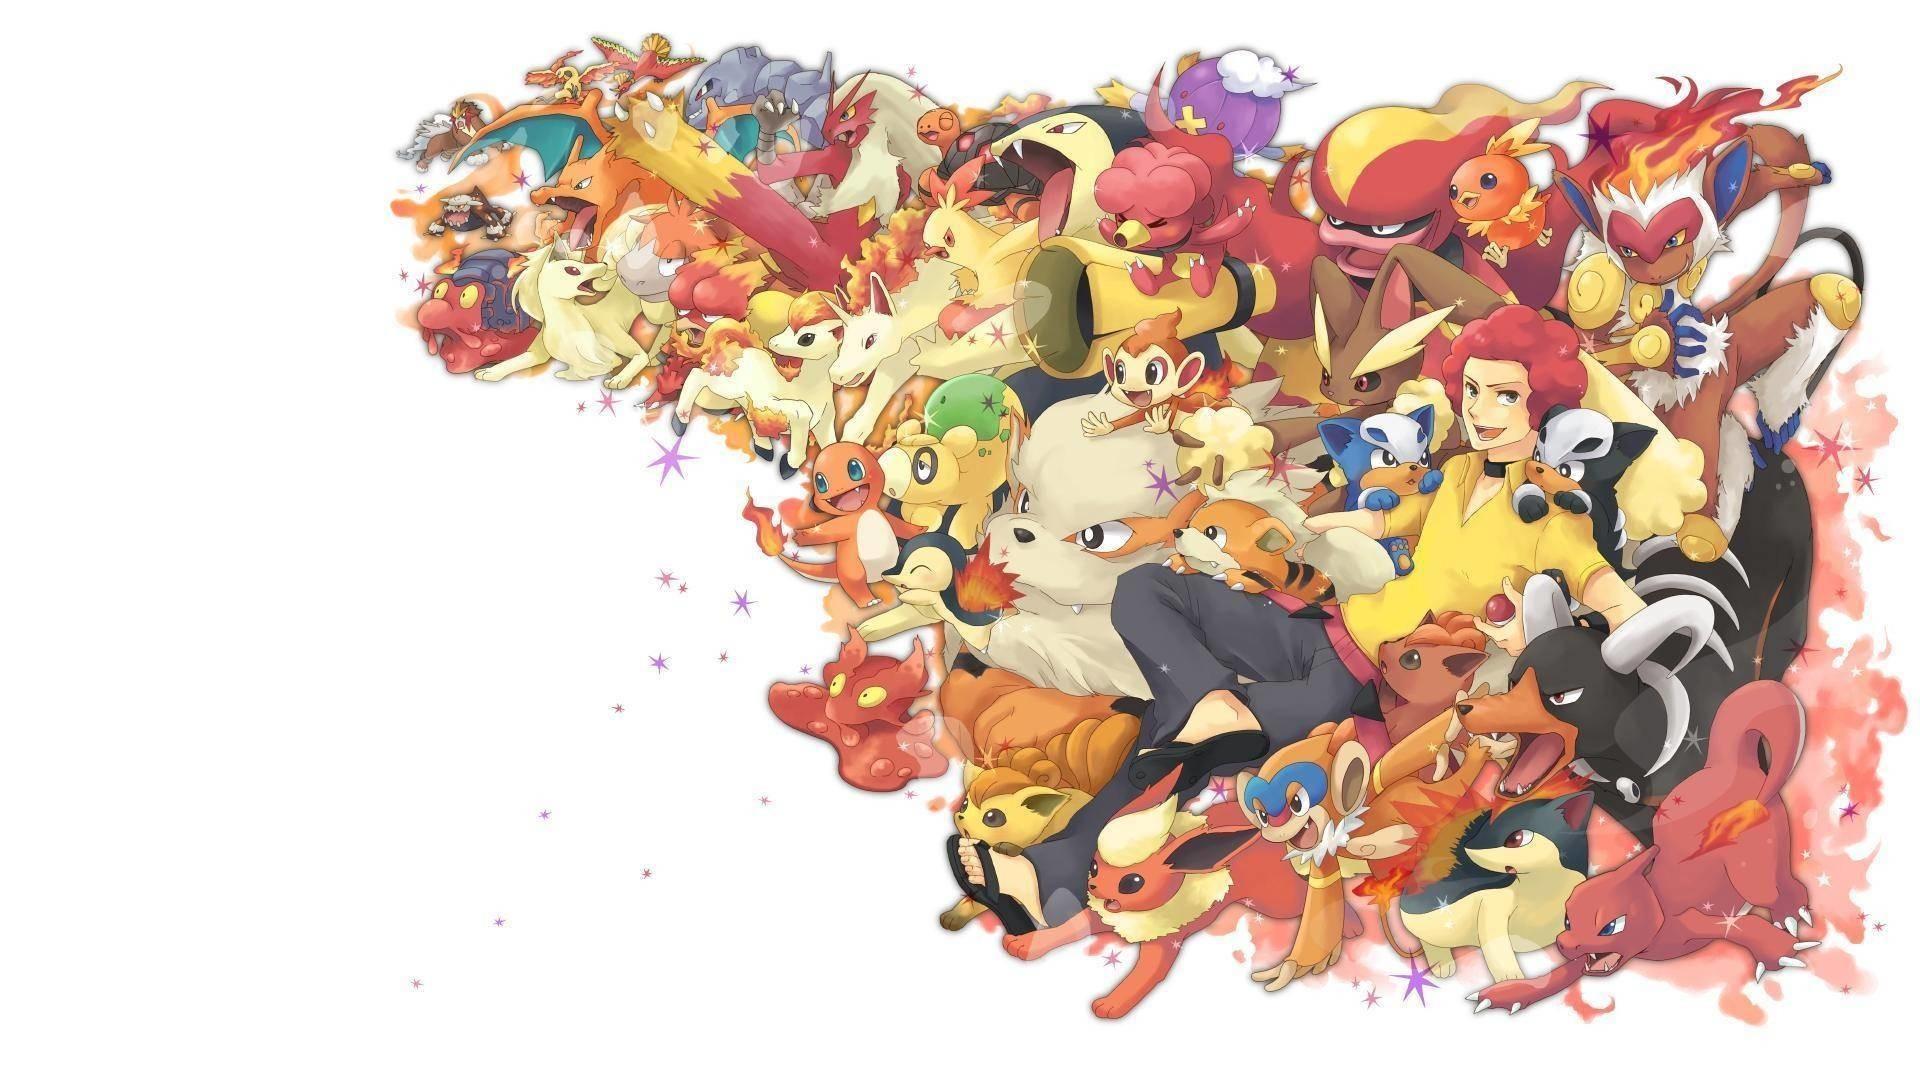 best pokemon backgrounds 4k